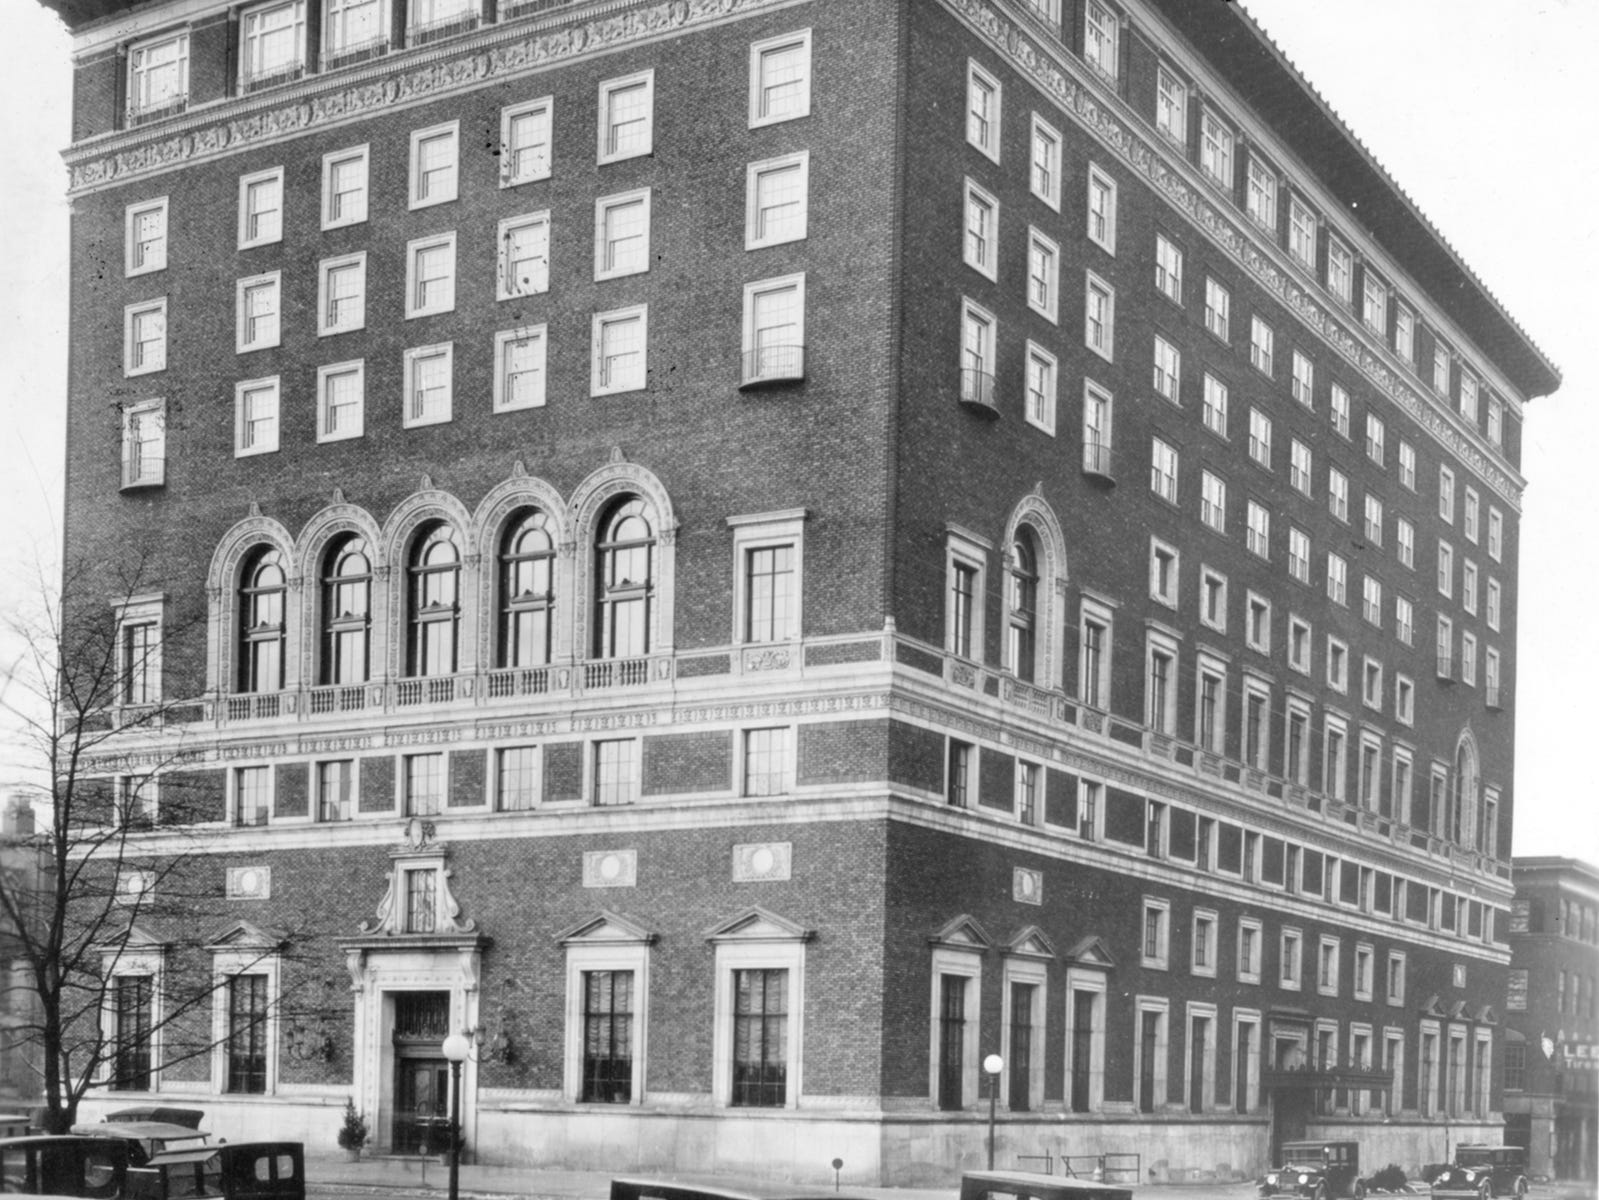 Indianapolis Athletic Club in 1920Õs.